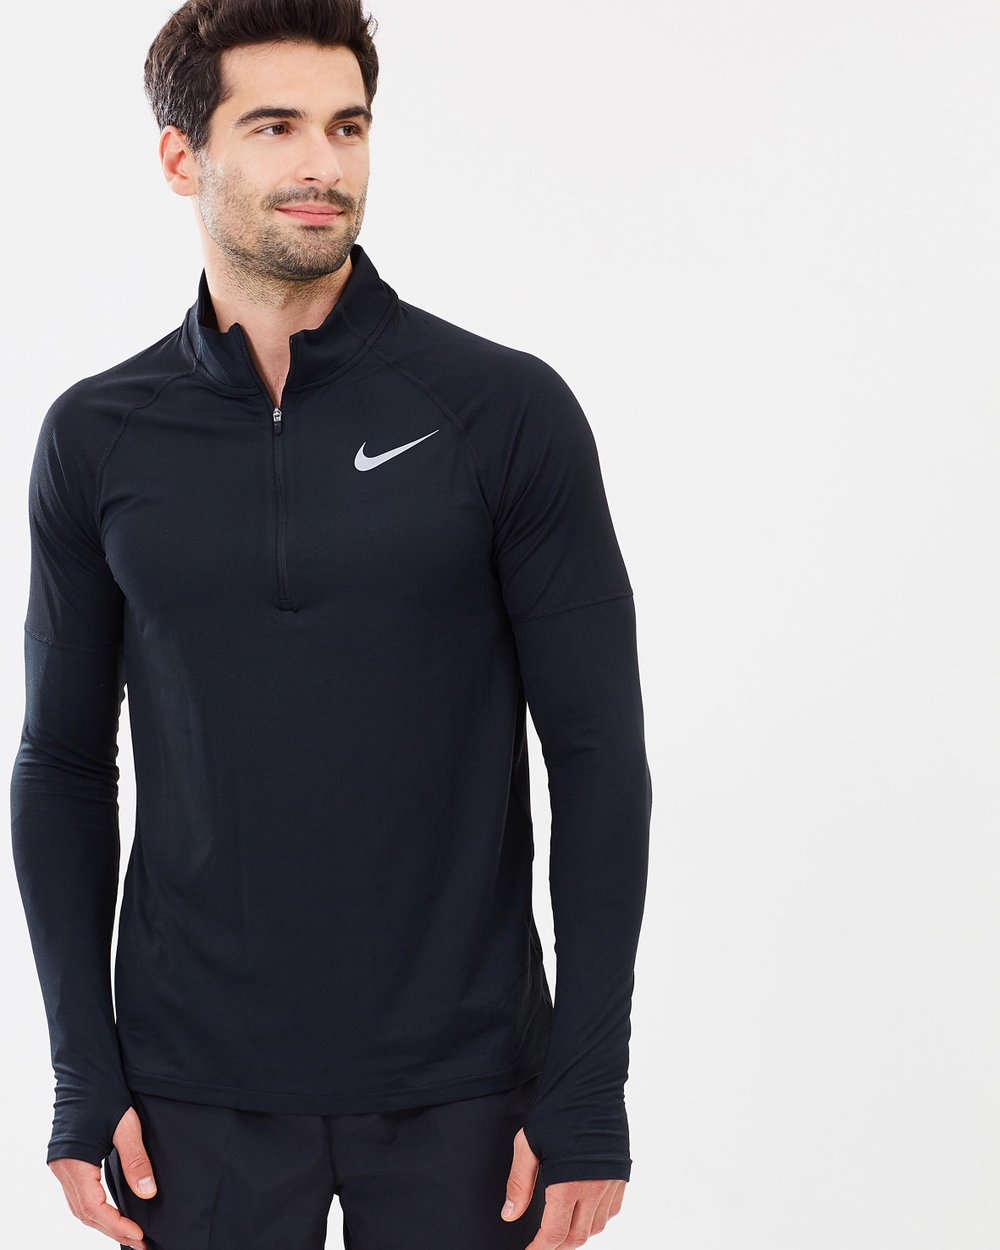 47622bd3e Element 2.0 Half-Zip Top - Men's by Nike Online   THE ICONIC   Australia